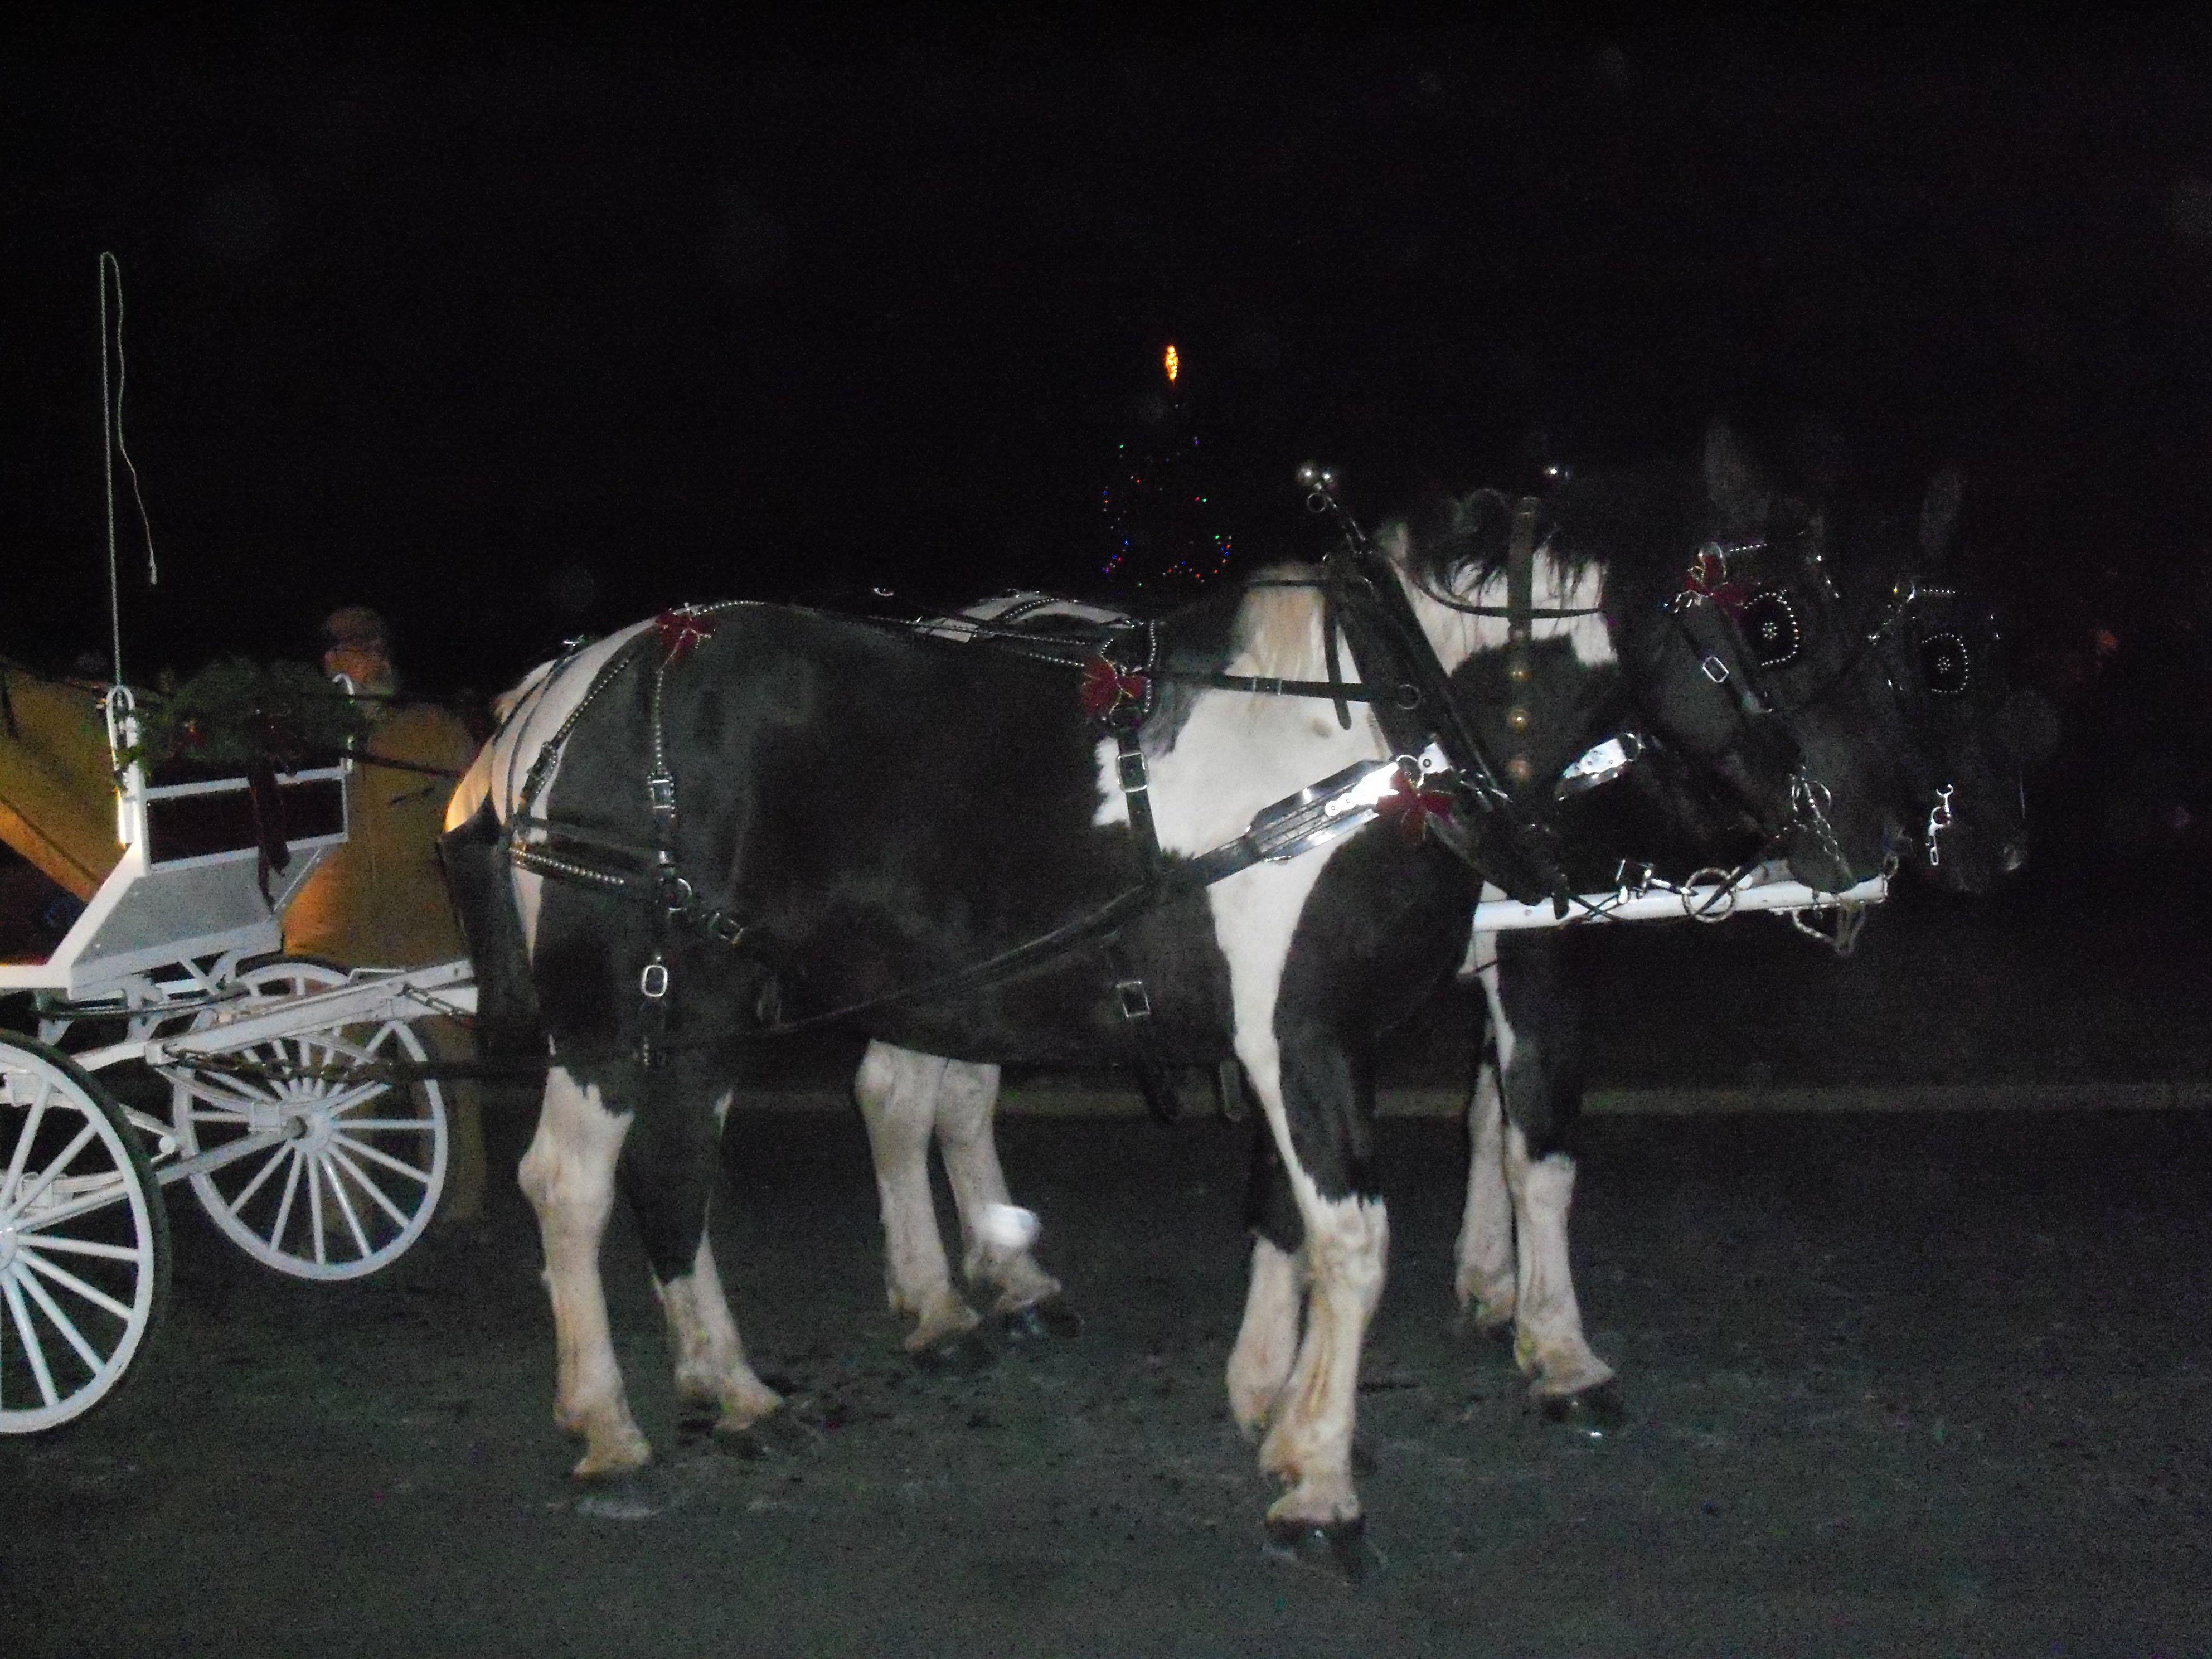 Carlisle Barracks Tree Lighting Ceremony And Carriage Ride